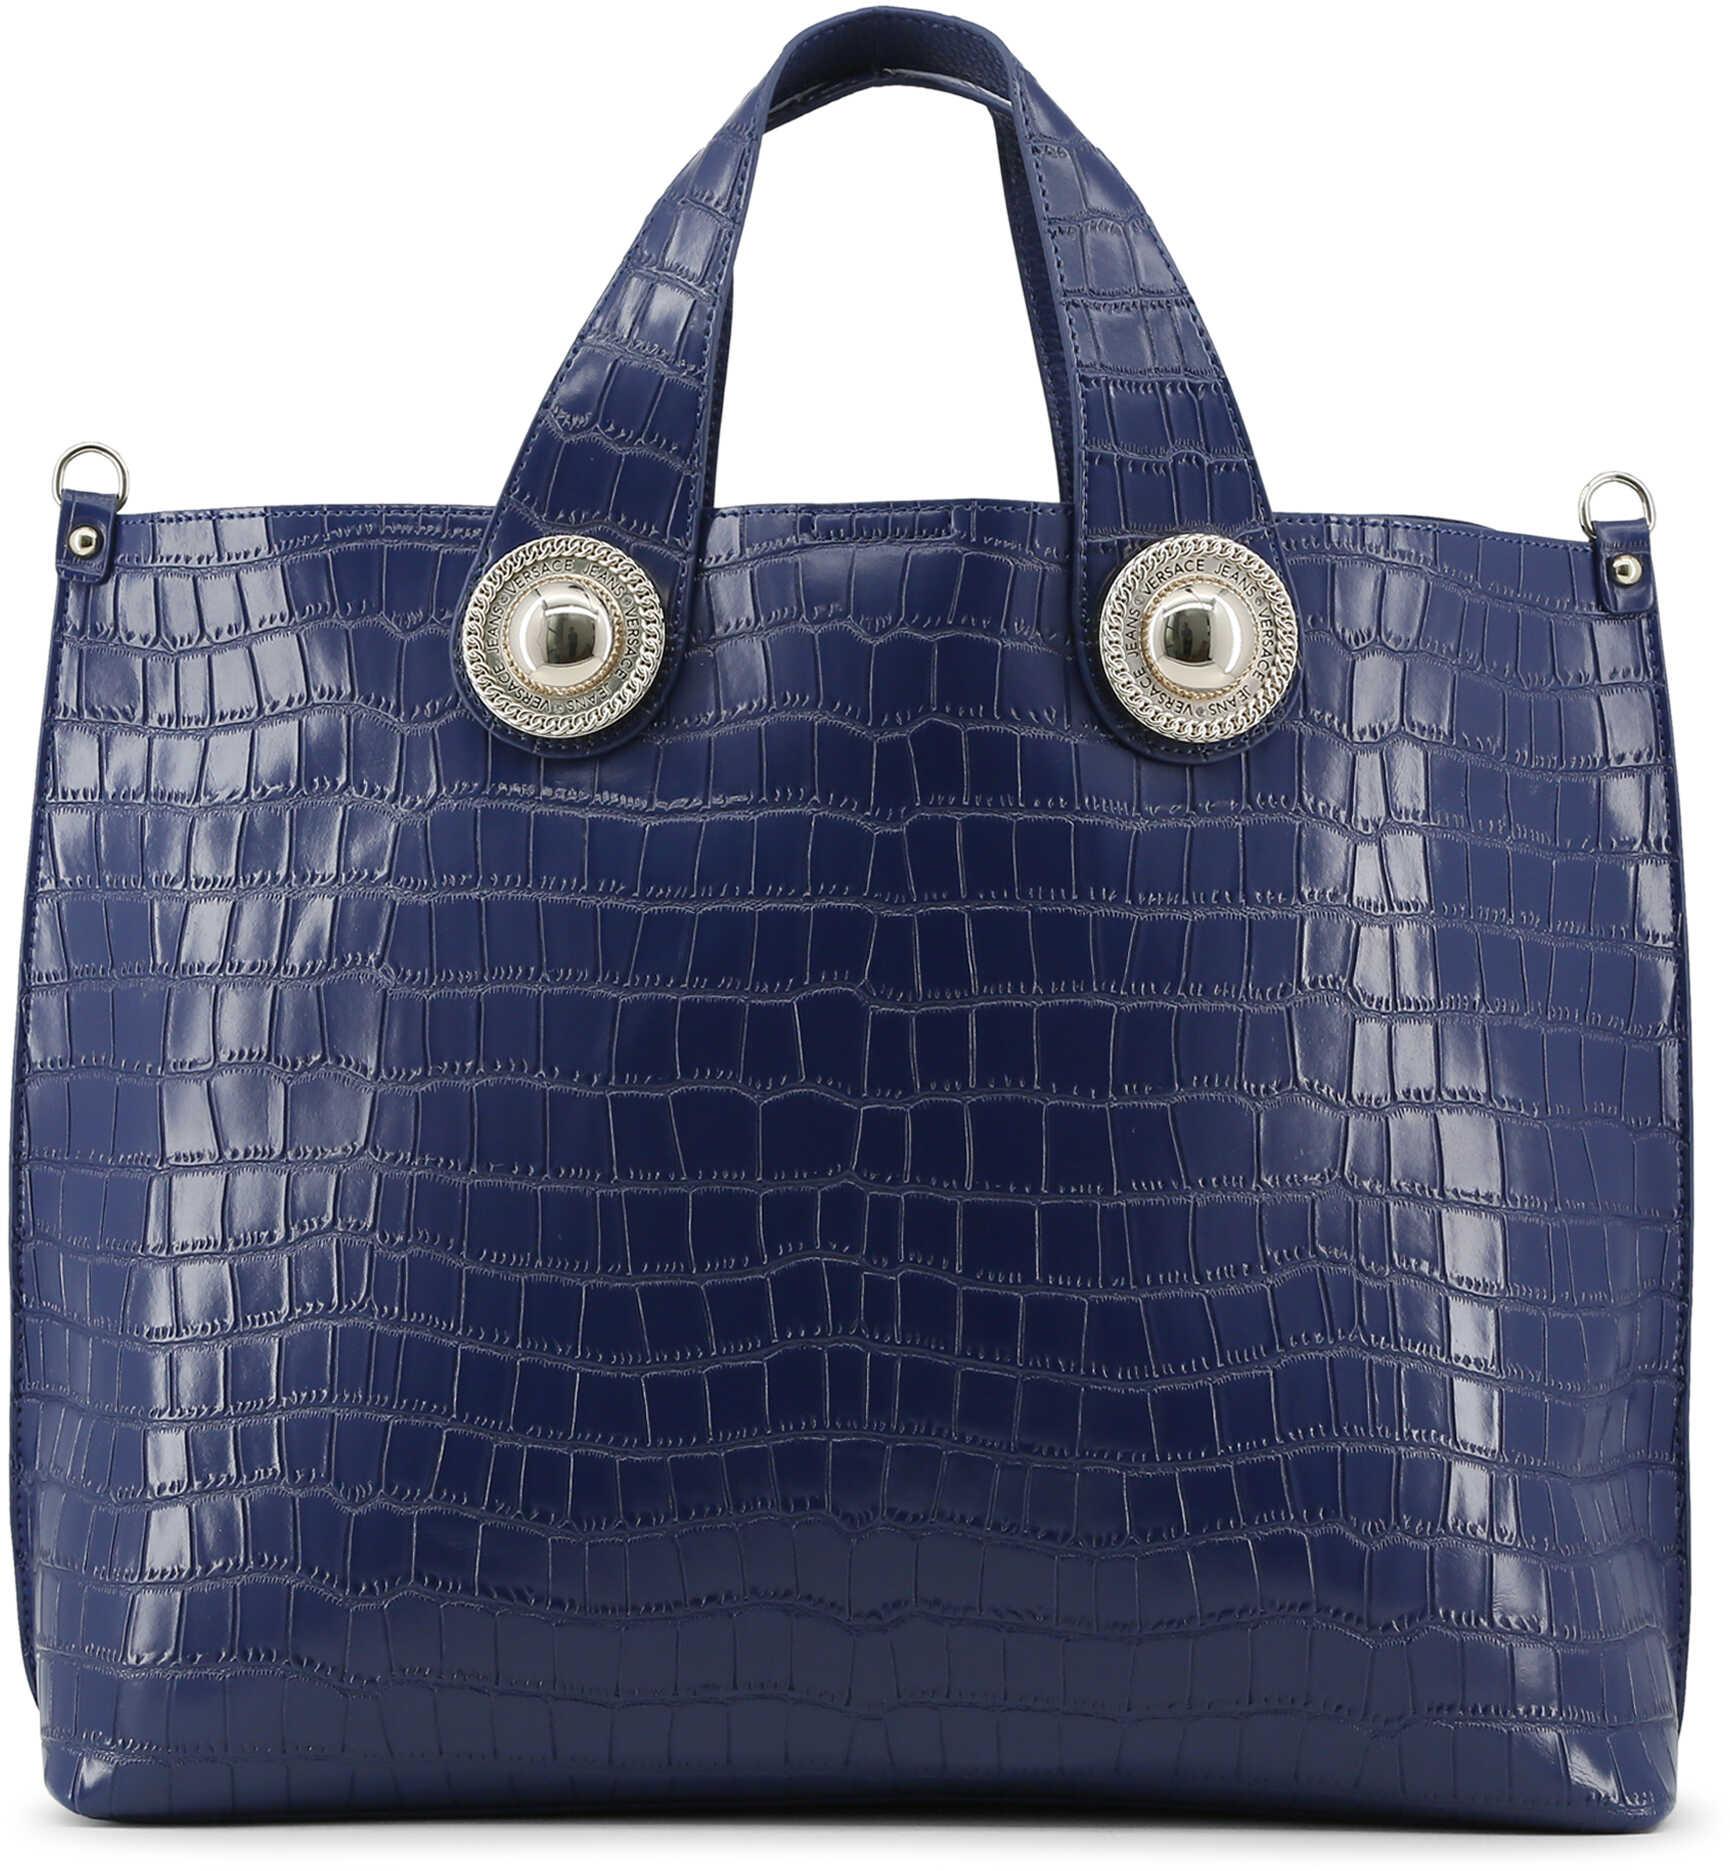 Versace Jeans E1Vqbbga_75456 Blue